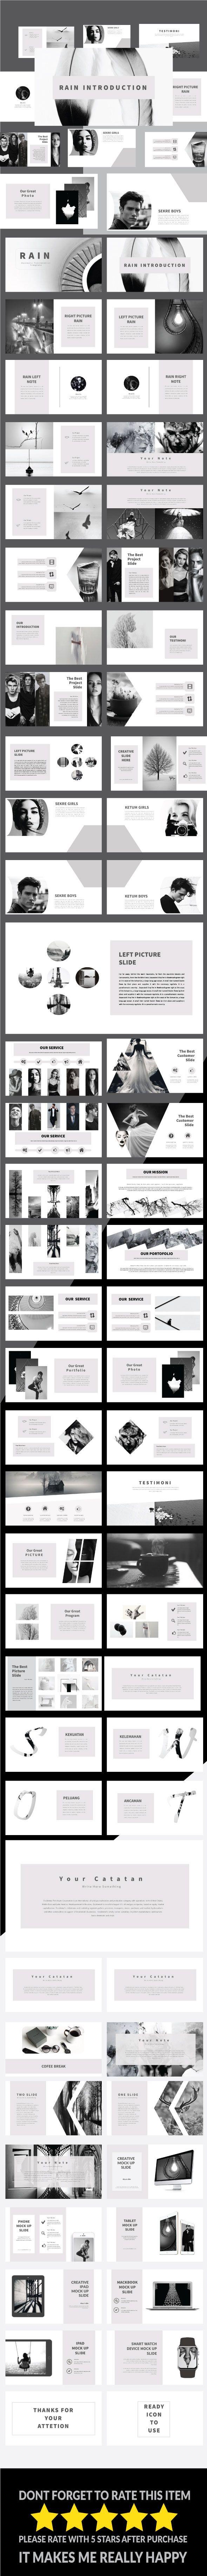 Rain - Multipurpose PowerPoint Template - PowerPoint Templates Presentation Templates Download here: https://graphicriver.net/item/rain-multipurpose-powerpoint-template/19842080?ref=classicdesignp